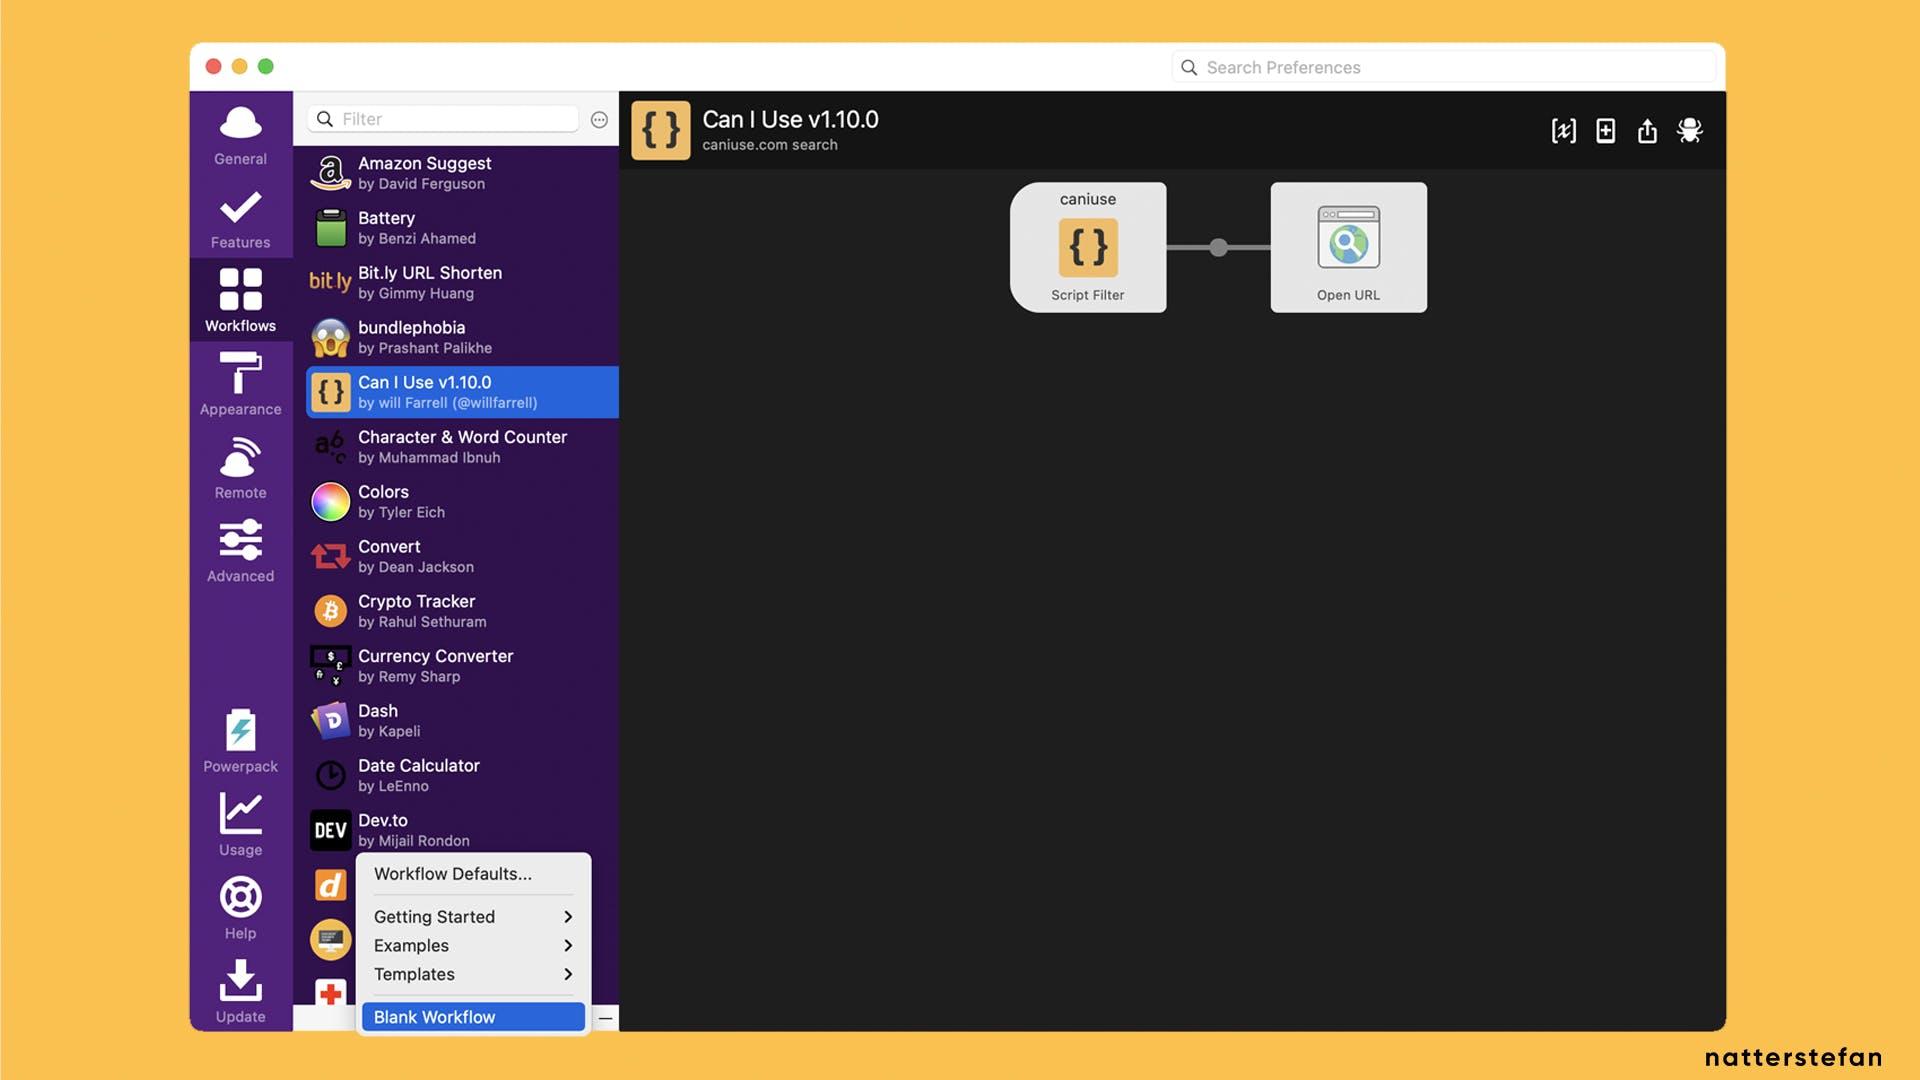 Create Blank Workflow